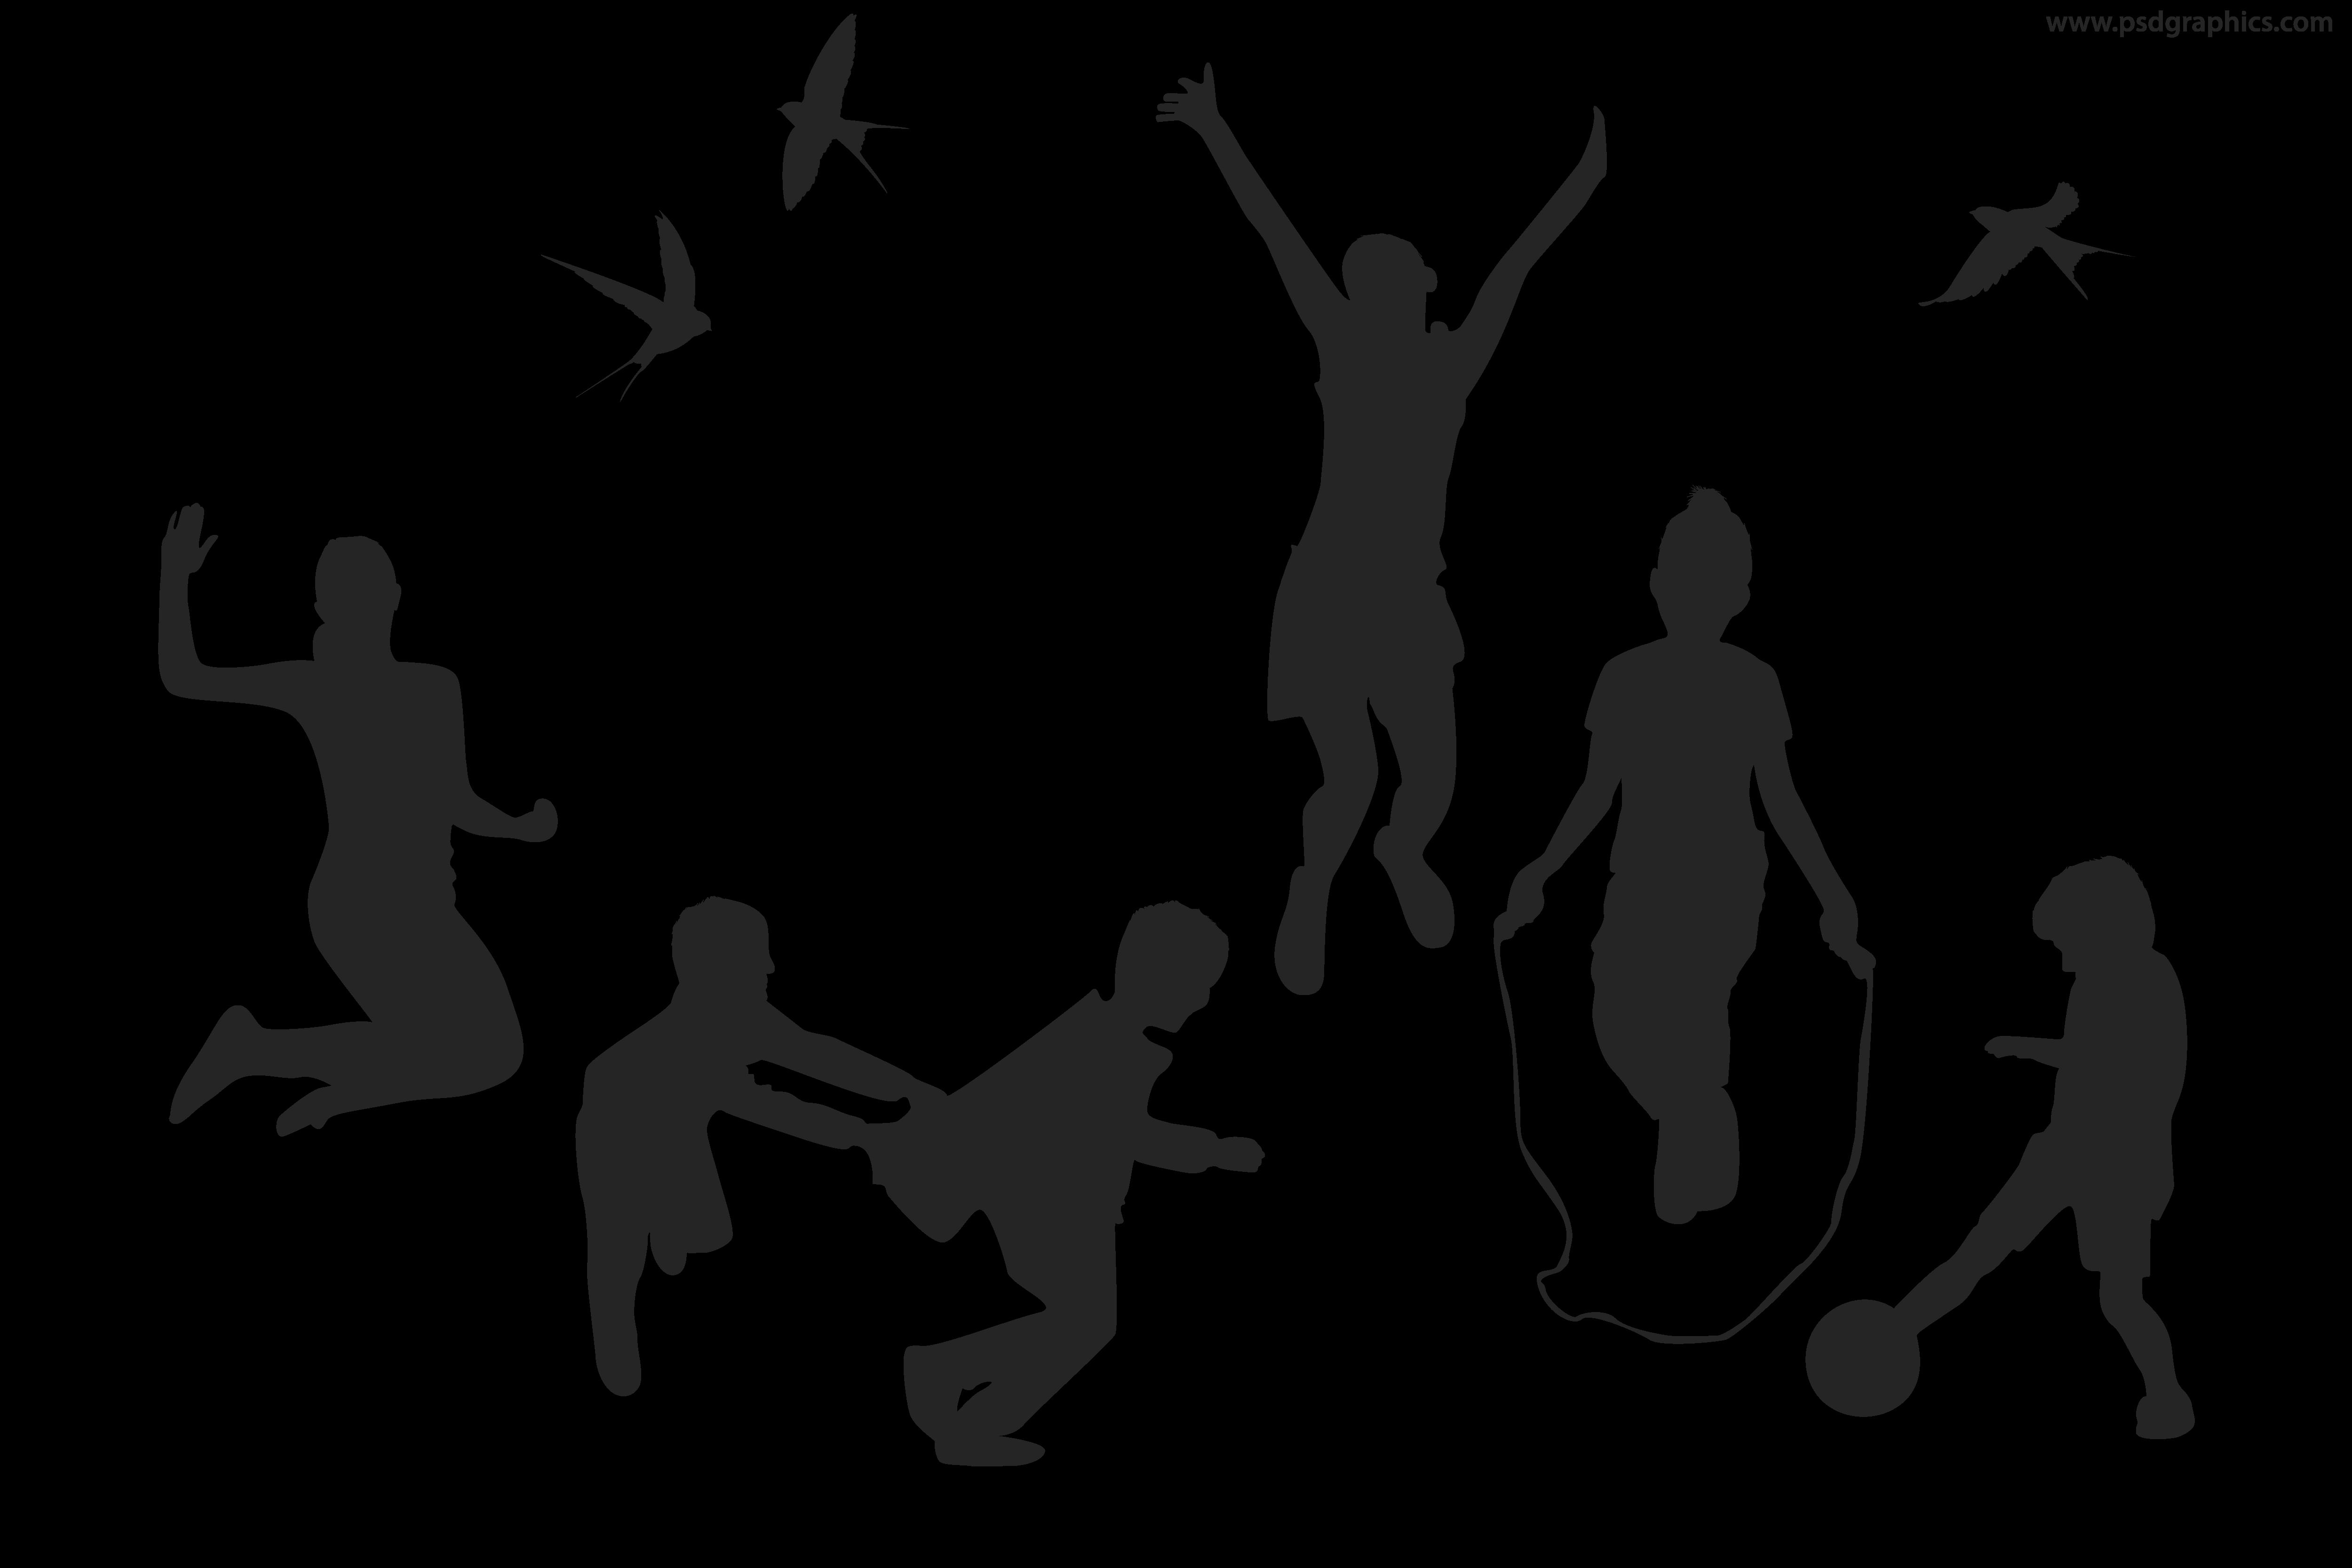 5000x3333 Playful children vector silhouettes PSDGraphics Cold shoulder